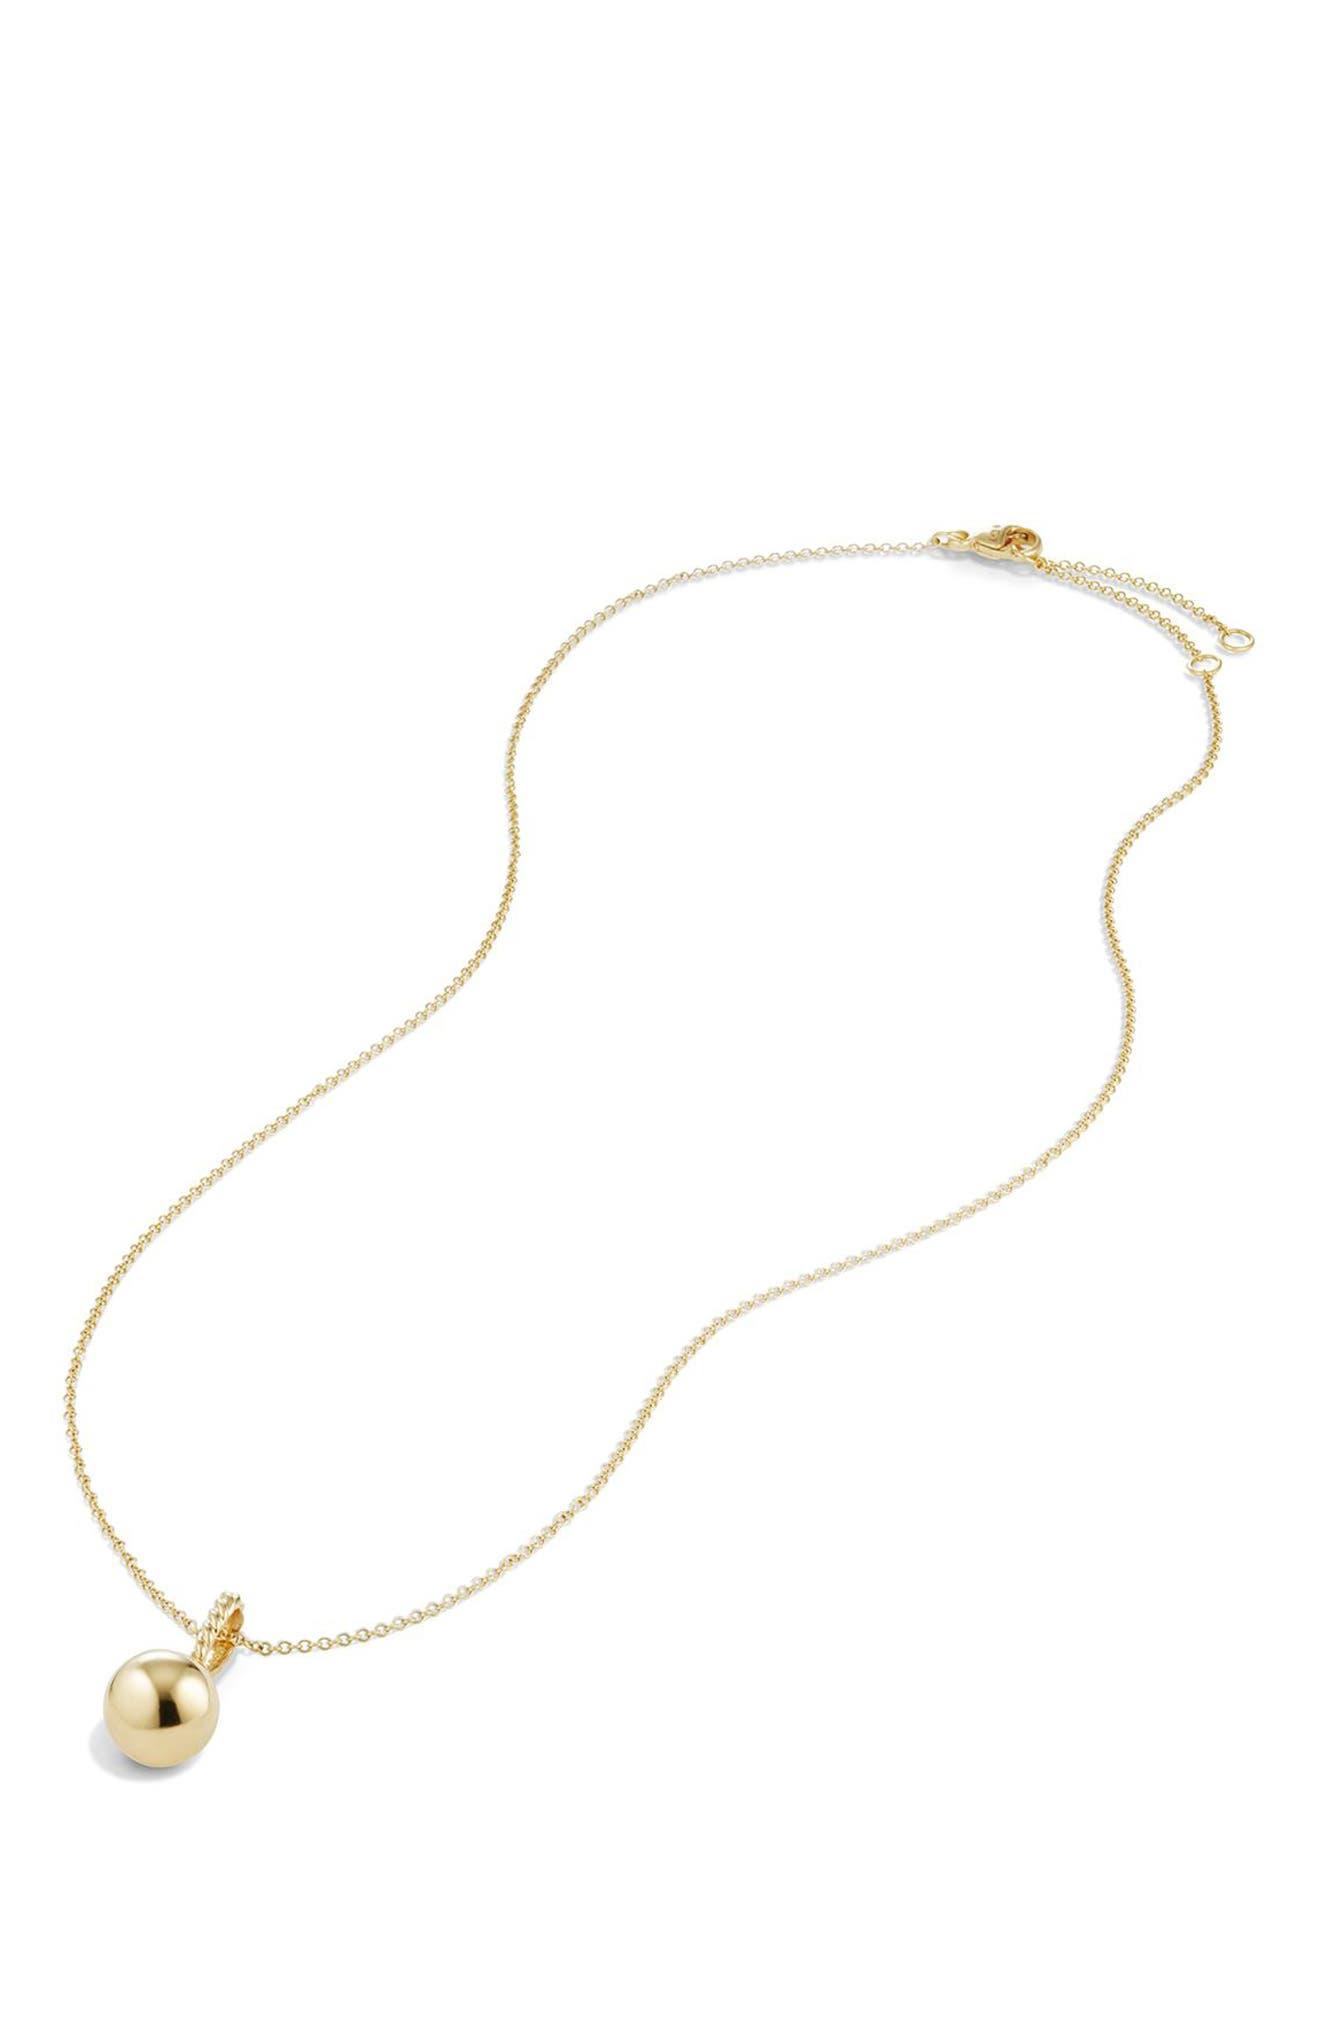 By David Yurman 'Solari' Pendant Necklace in 18K Gold,                             Alternate thumbnail 3, color,                             GOLD DOME